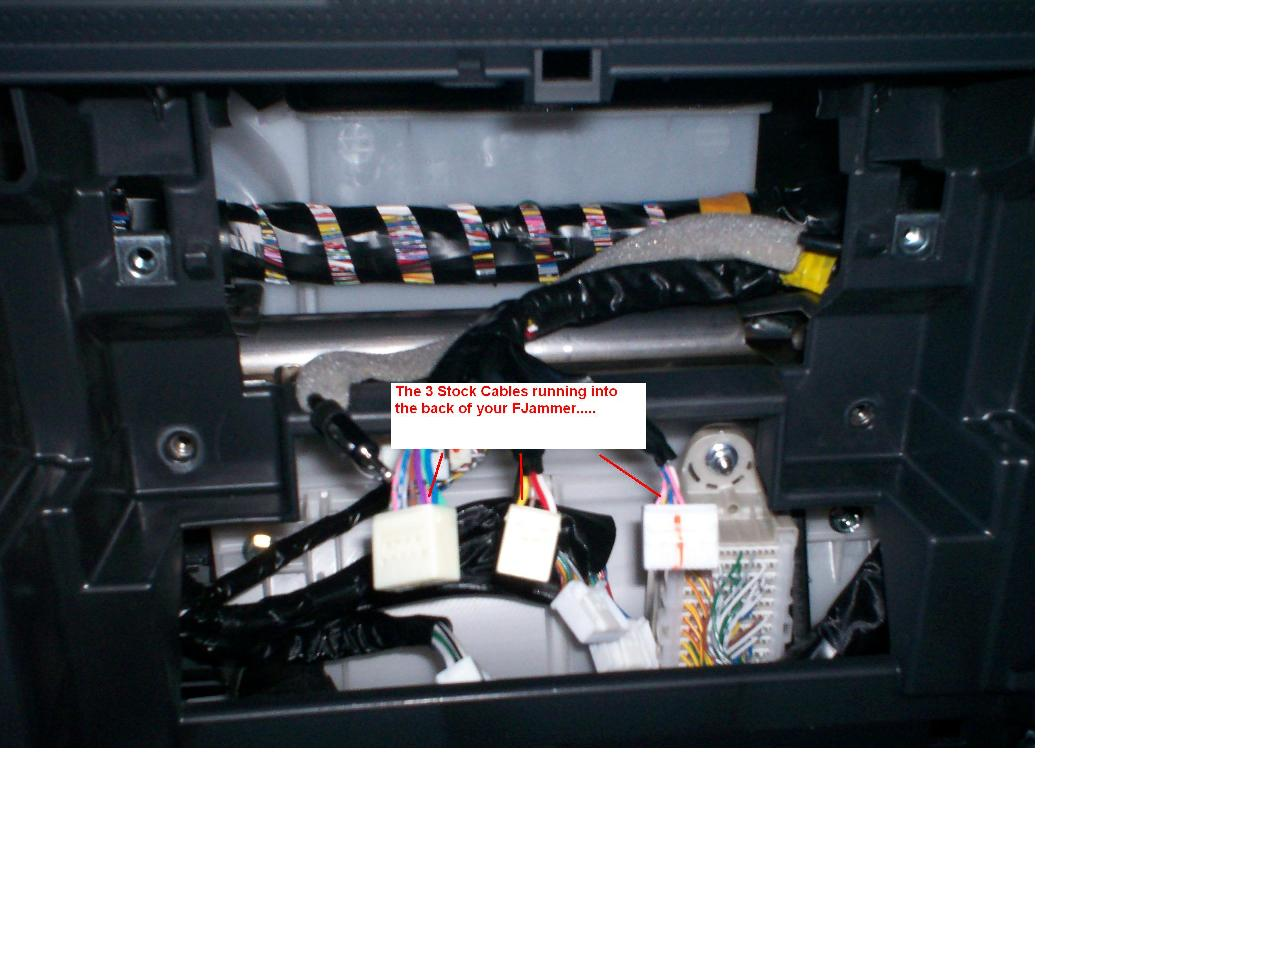 Parrot Ck3100 Wiring Diagram Ford Focus Along With Baixar Pou Para Pc